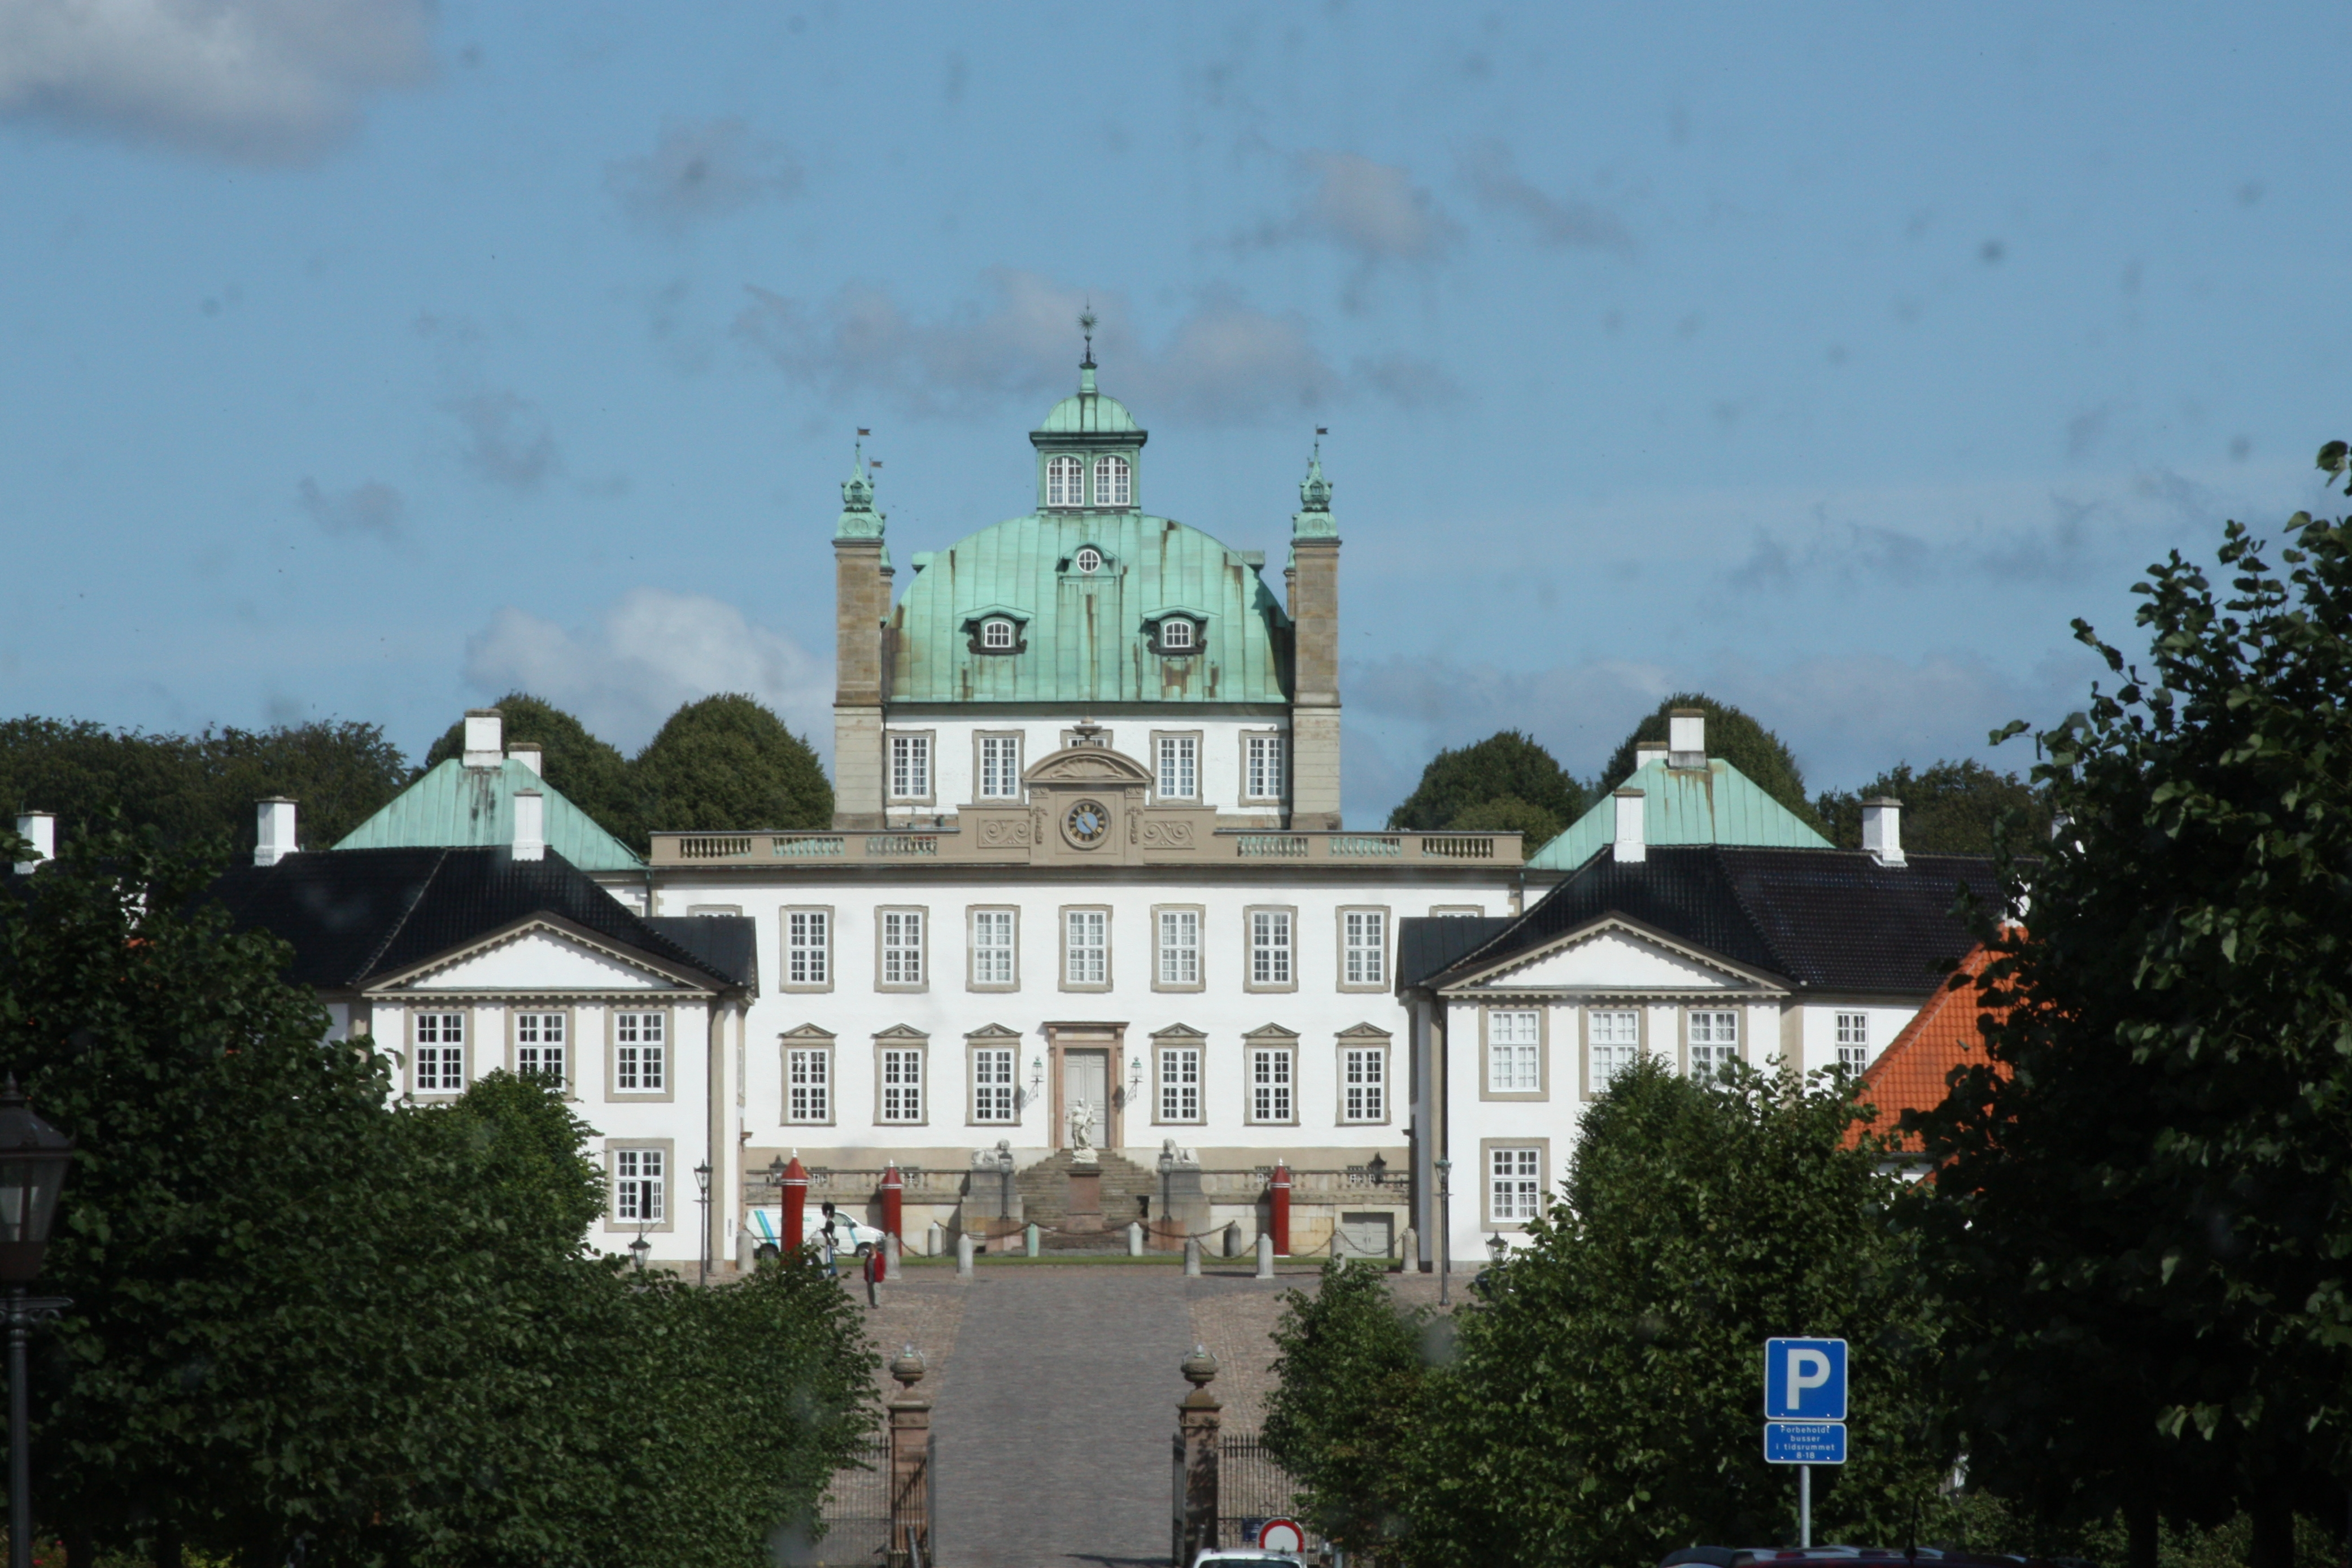 File:Fredensborg Slot 20090818 01.JPG - Wikimedia Commons